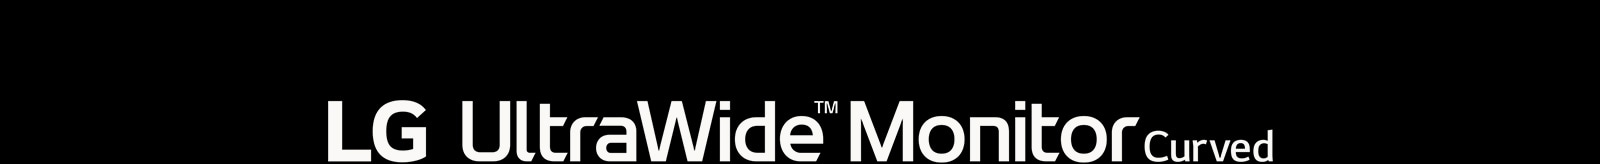 LG UltraWide™ Monitor Curved